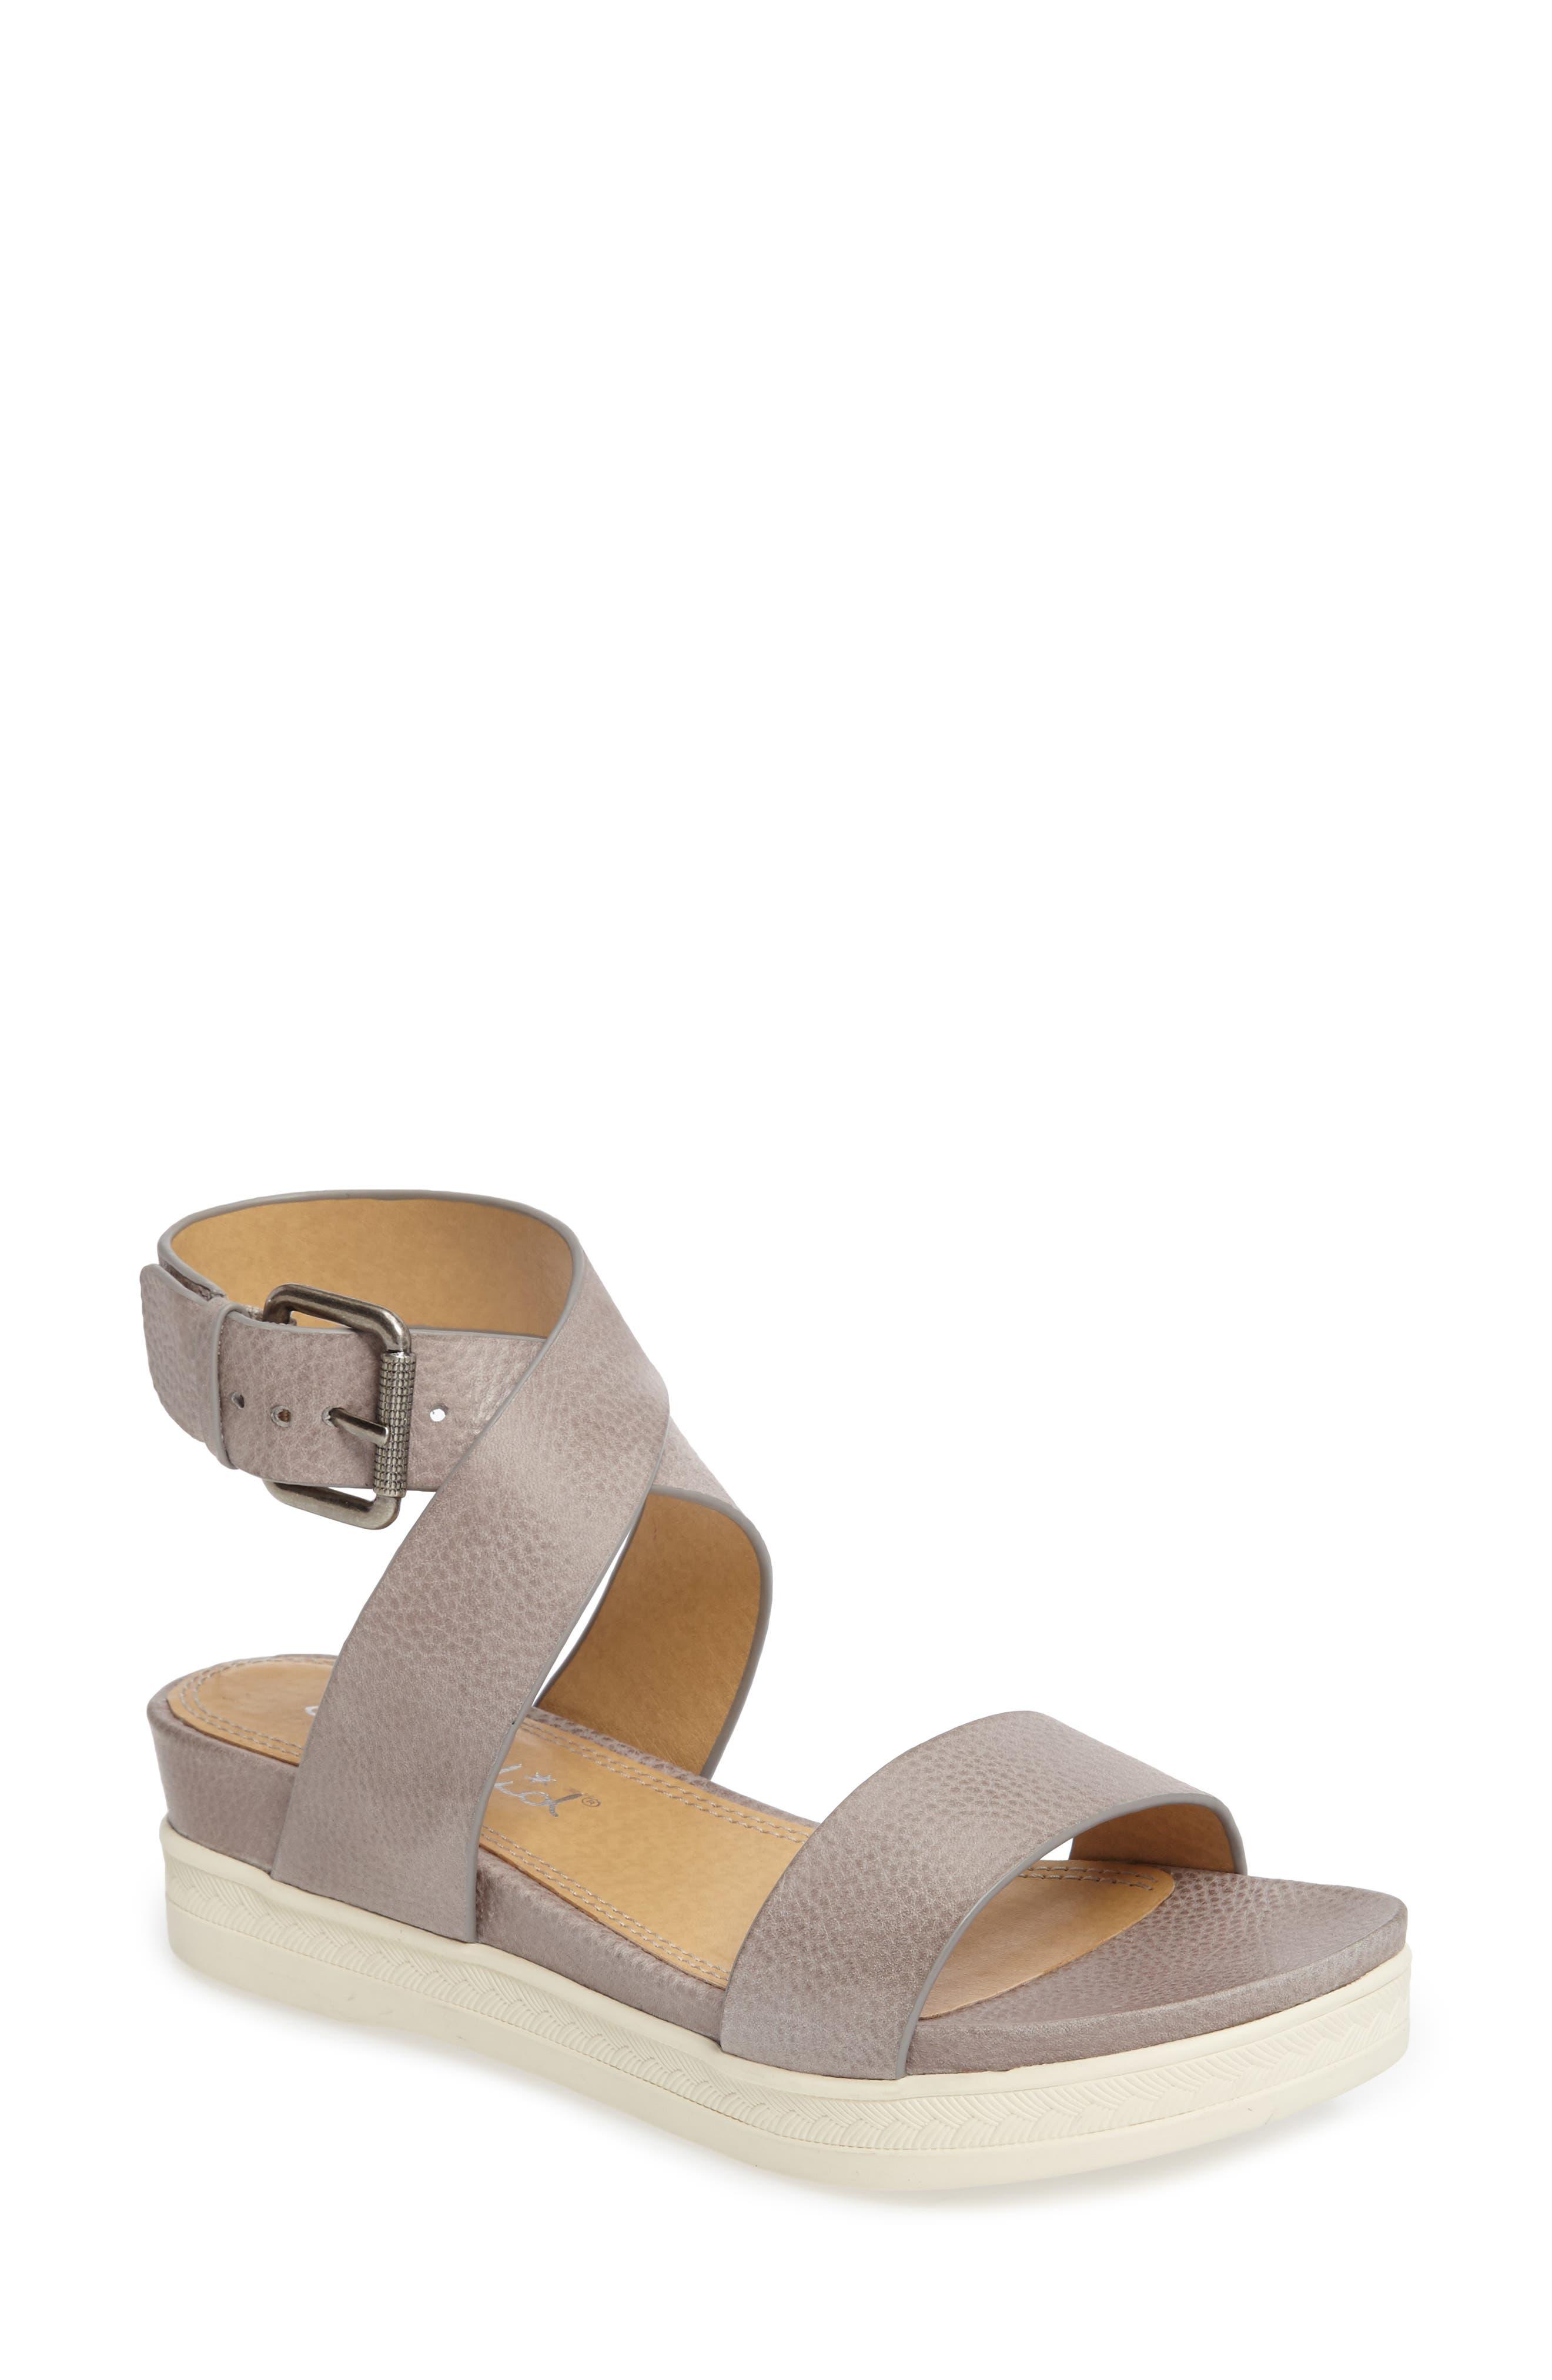 Julie Platform Sandal,                             Main thumbnail 1, color,                             Light Grey Leather